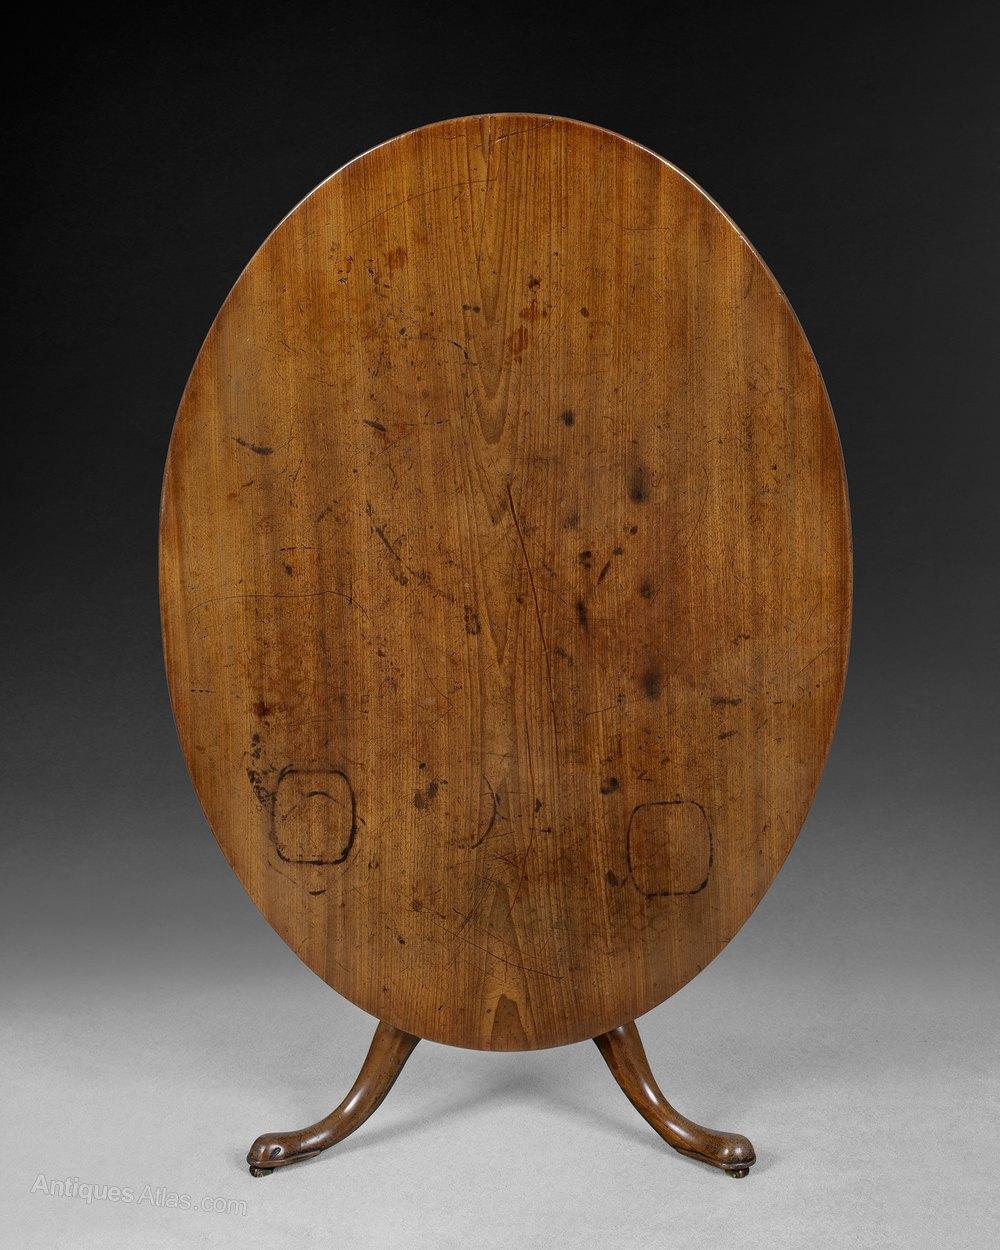 Mid 18th Century Mahogany Oval Breakfast Table Antiques